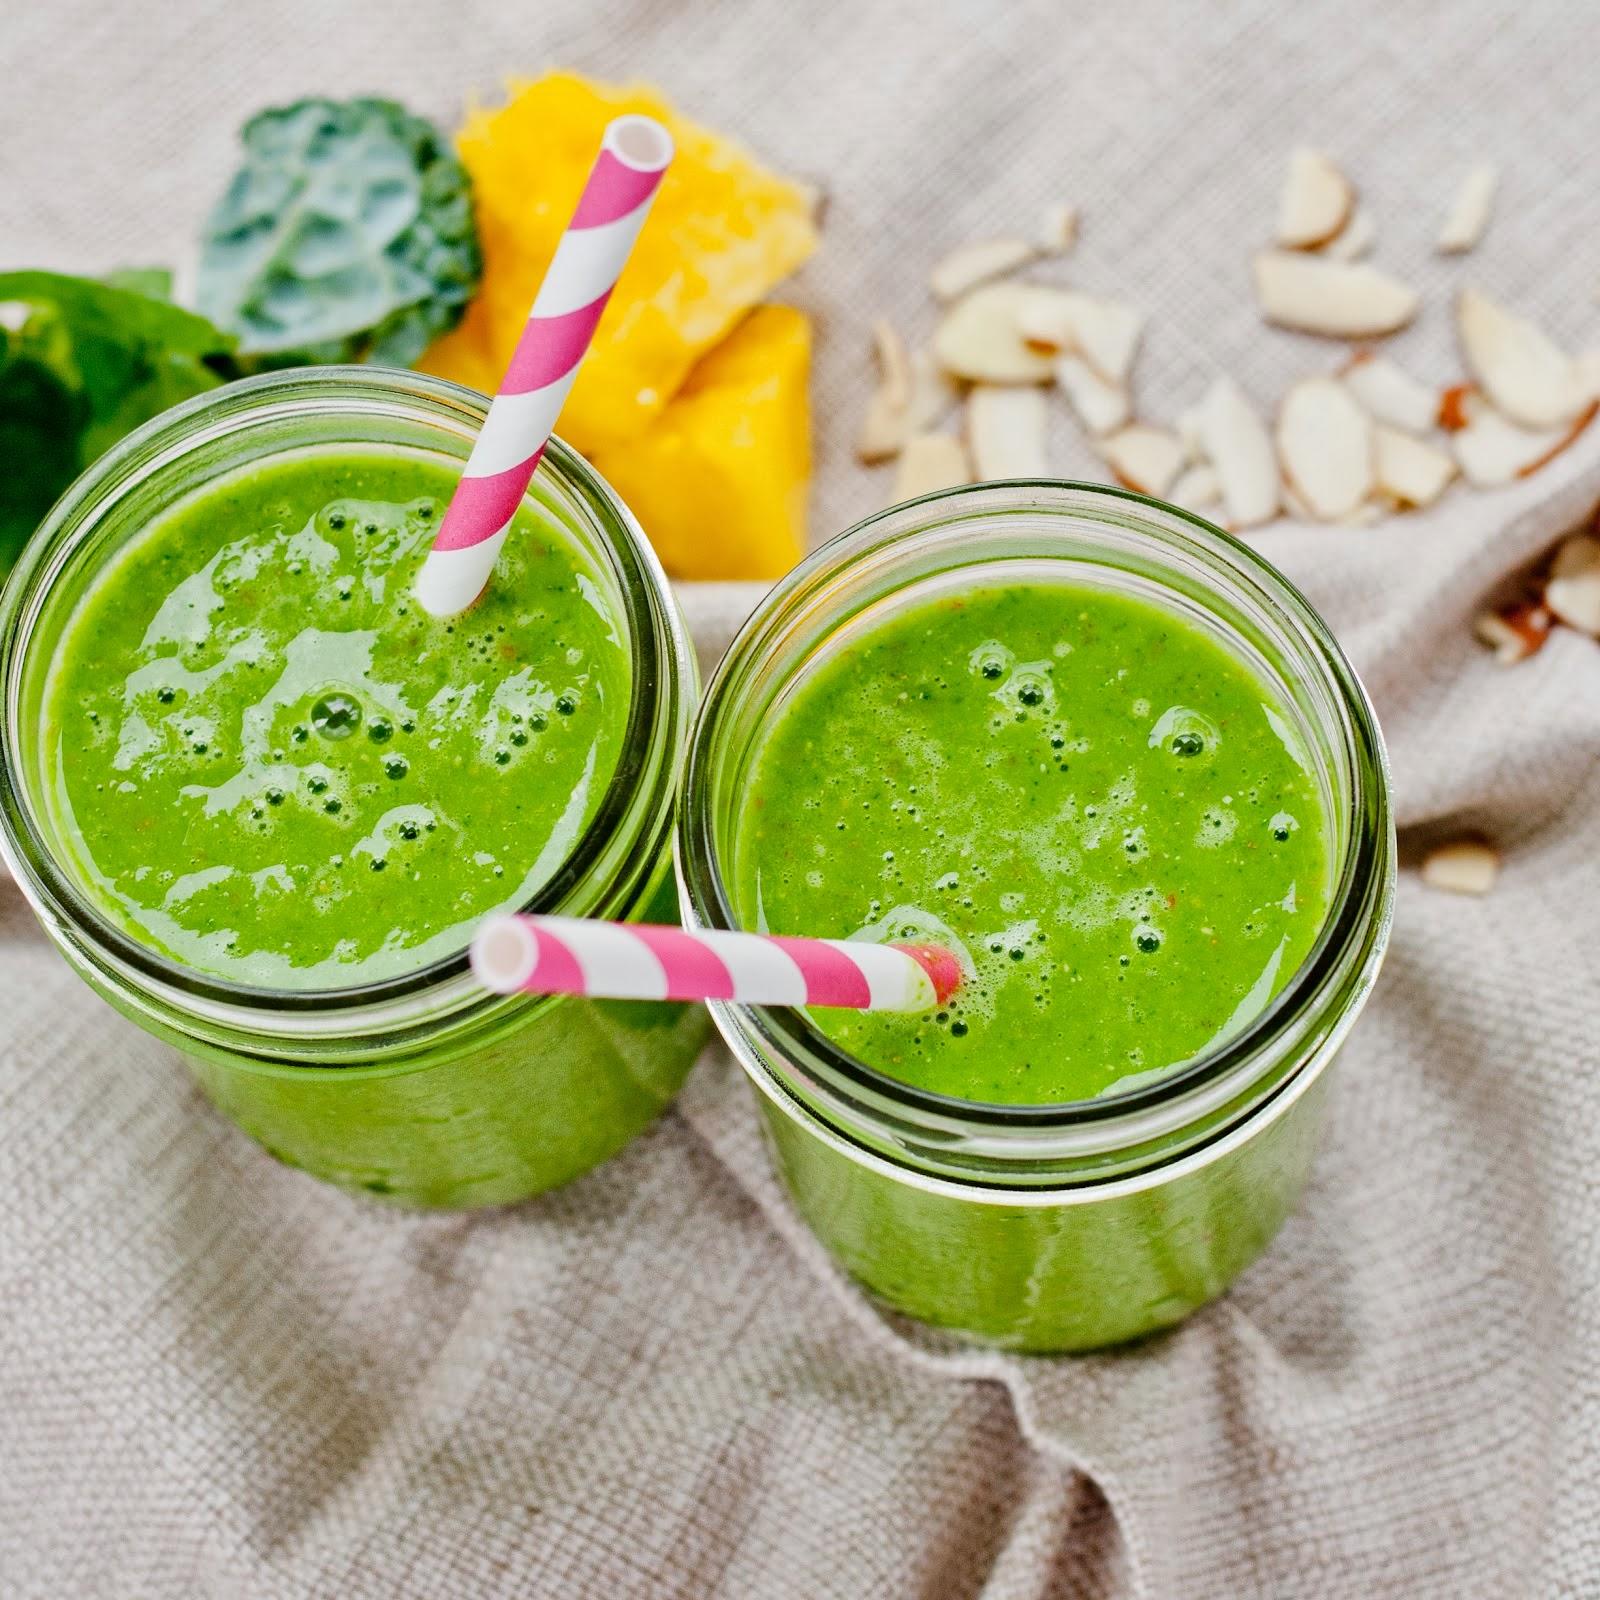 how to make green tea mango mantra